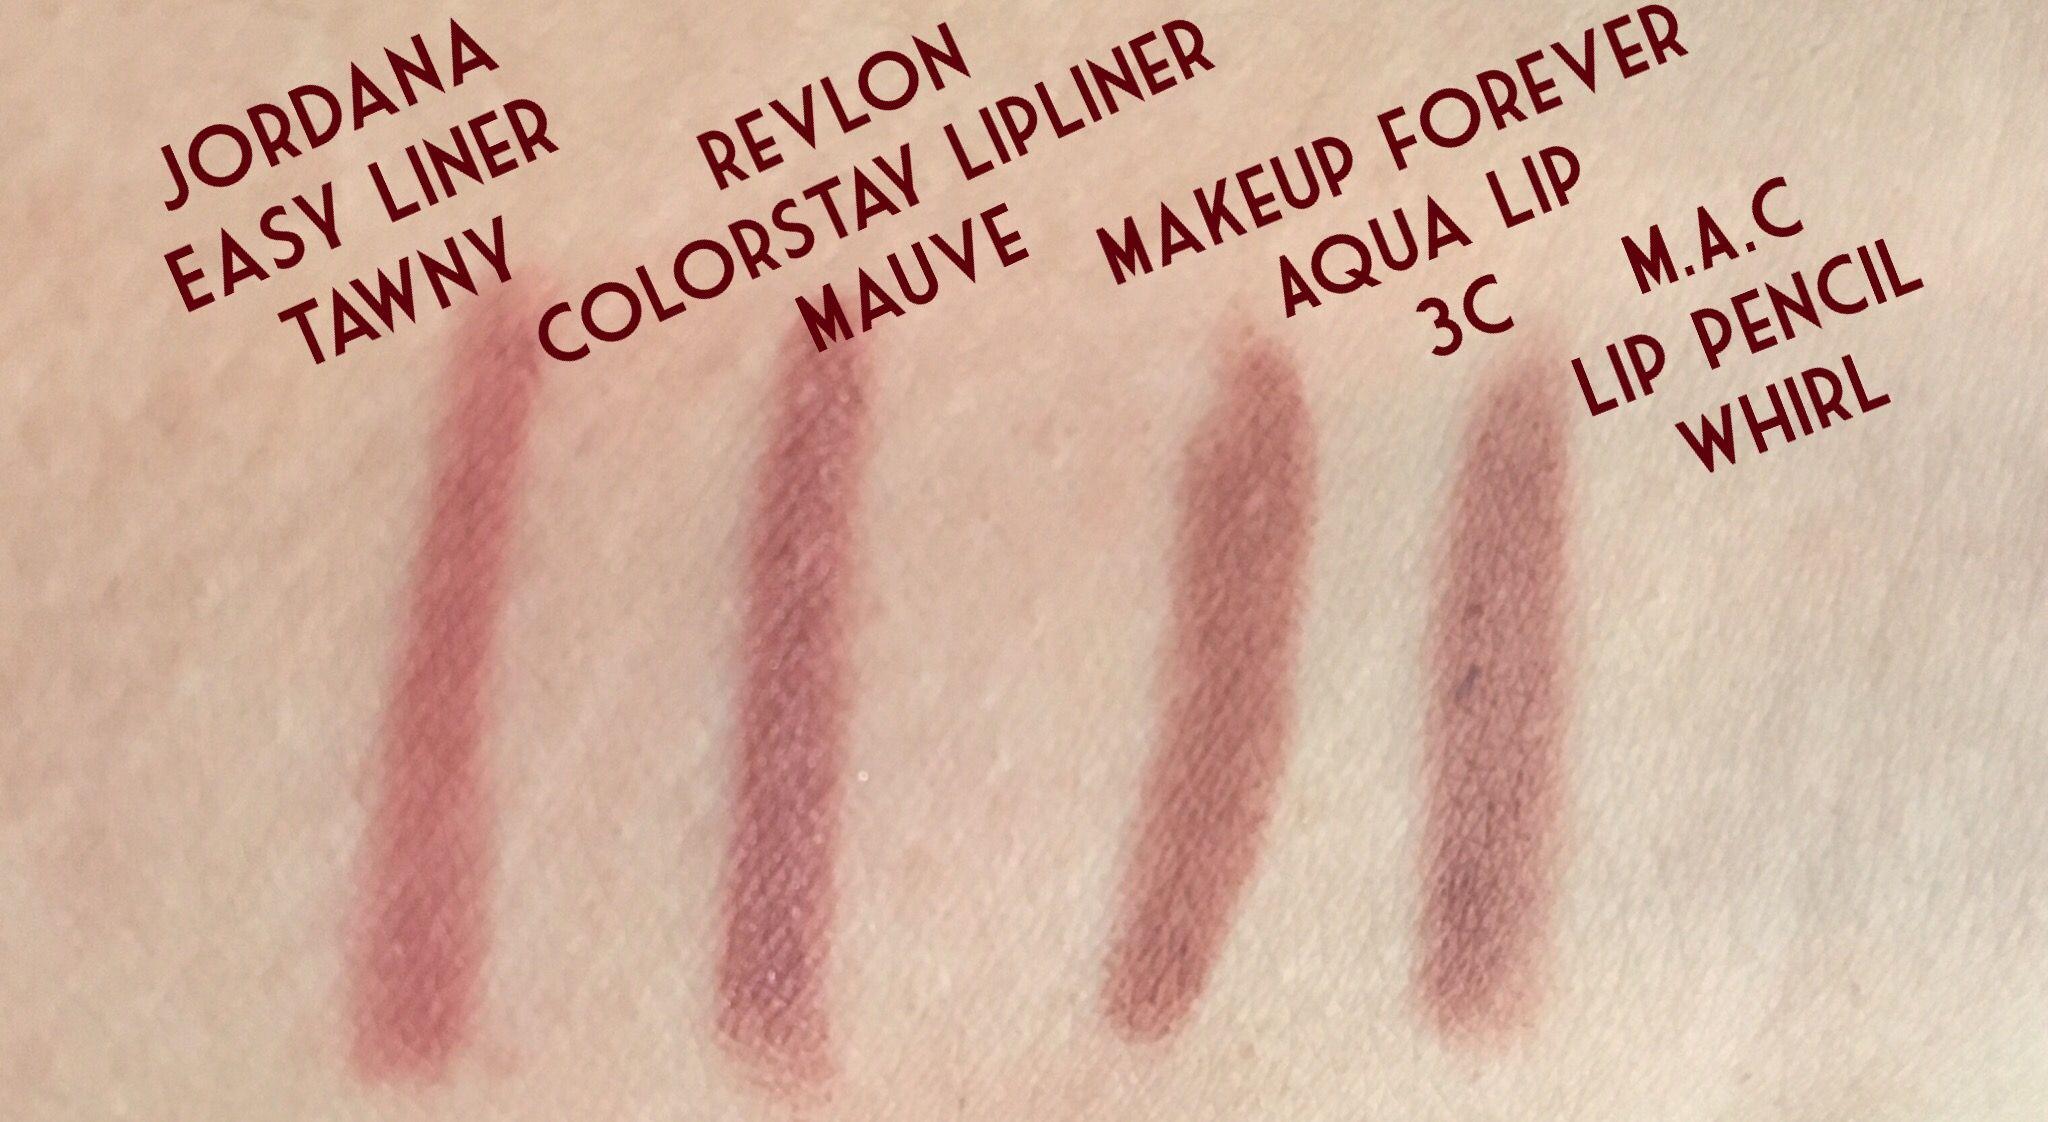 Aqua Lip Lipliner Pencil by Make Up For Ever #11